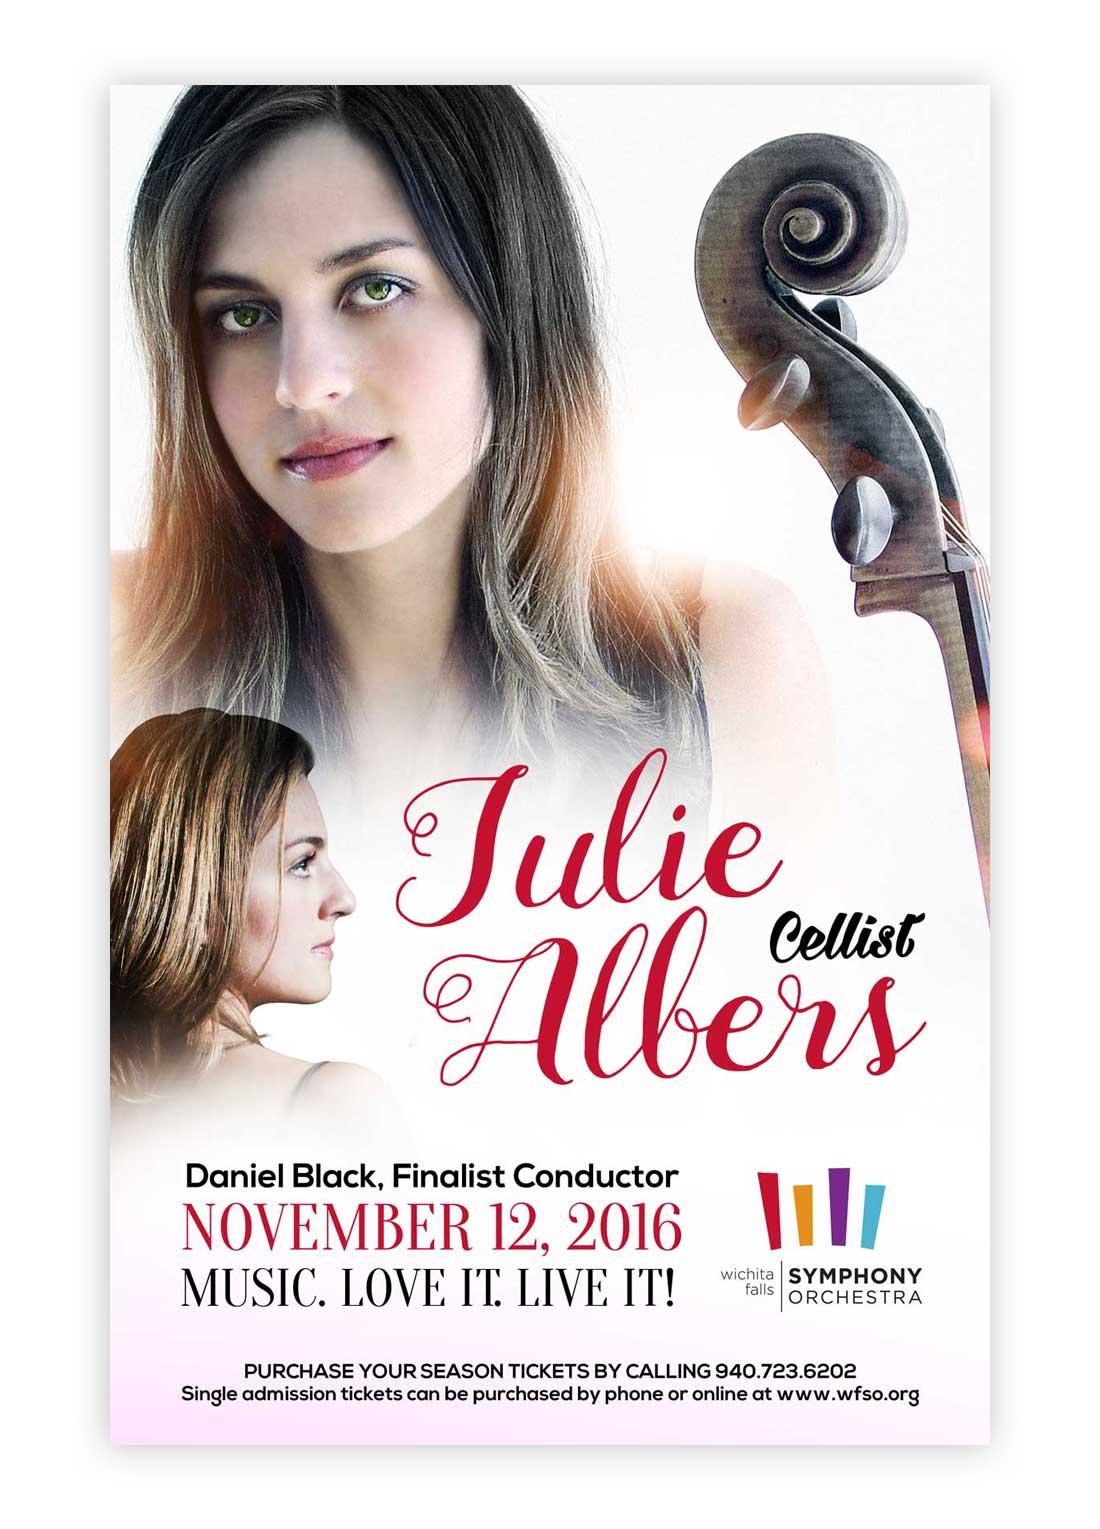 Julie Albers Music Concert Poster Design